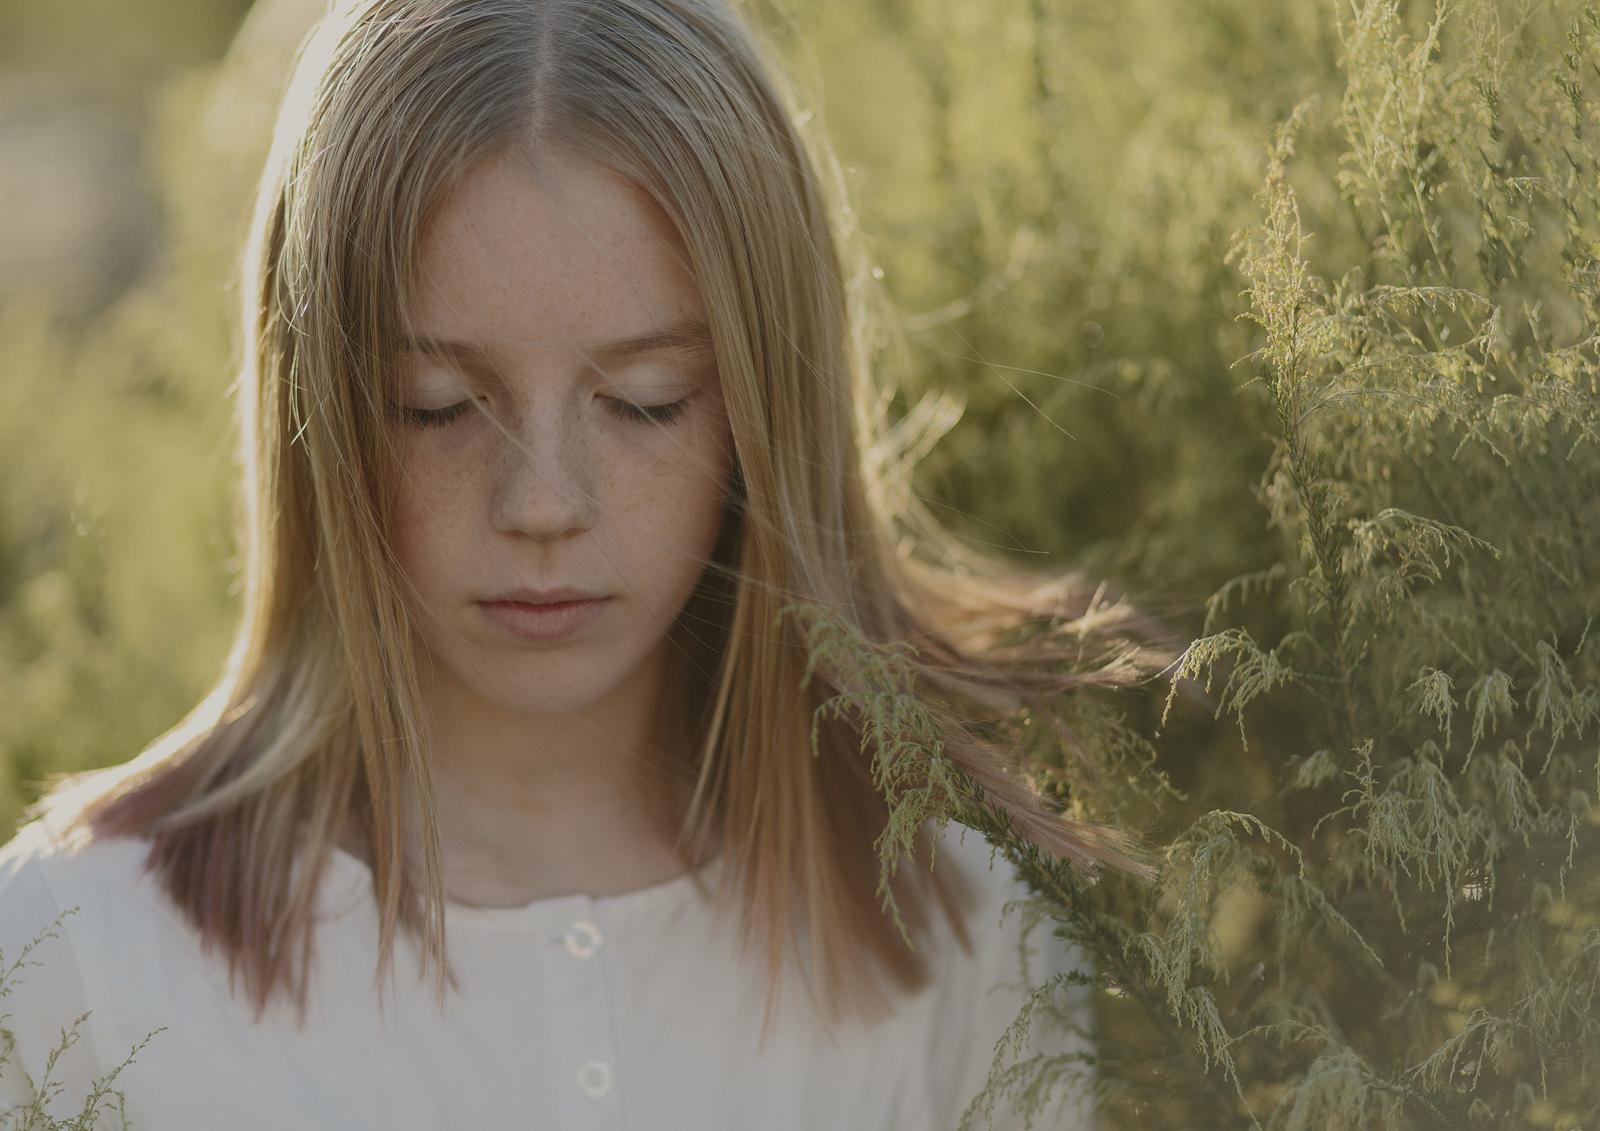 Teenage Fine Art Portraiture Melbourne